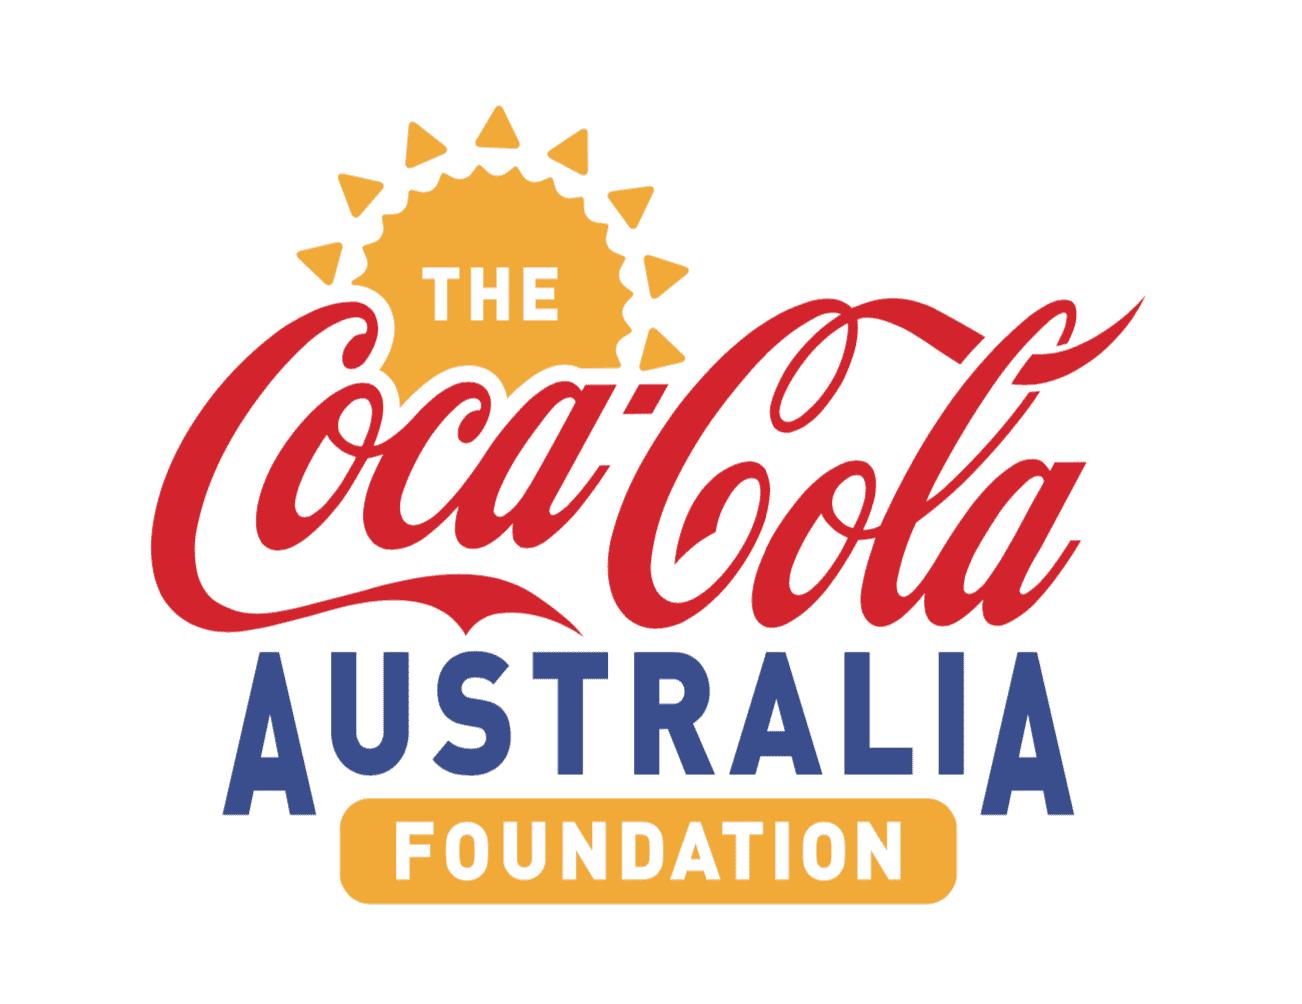 Coca-Cola Australia Foundation